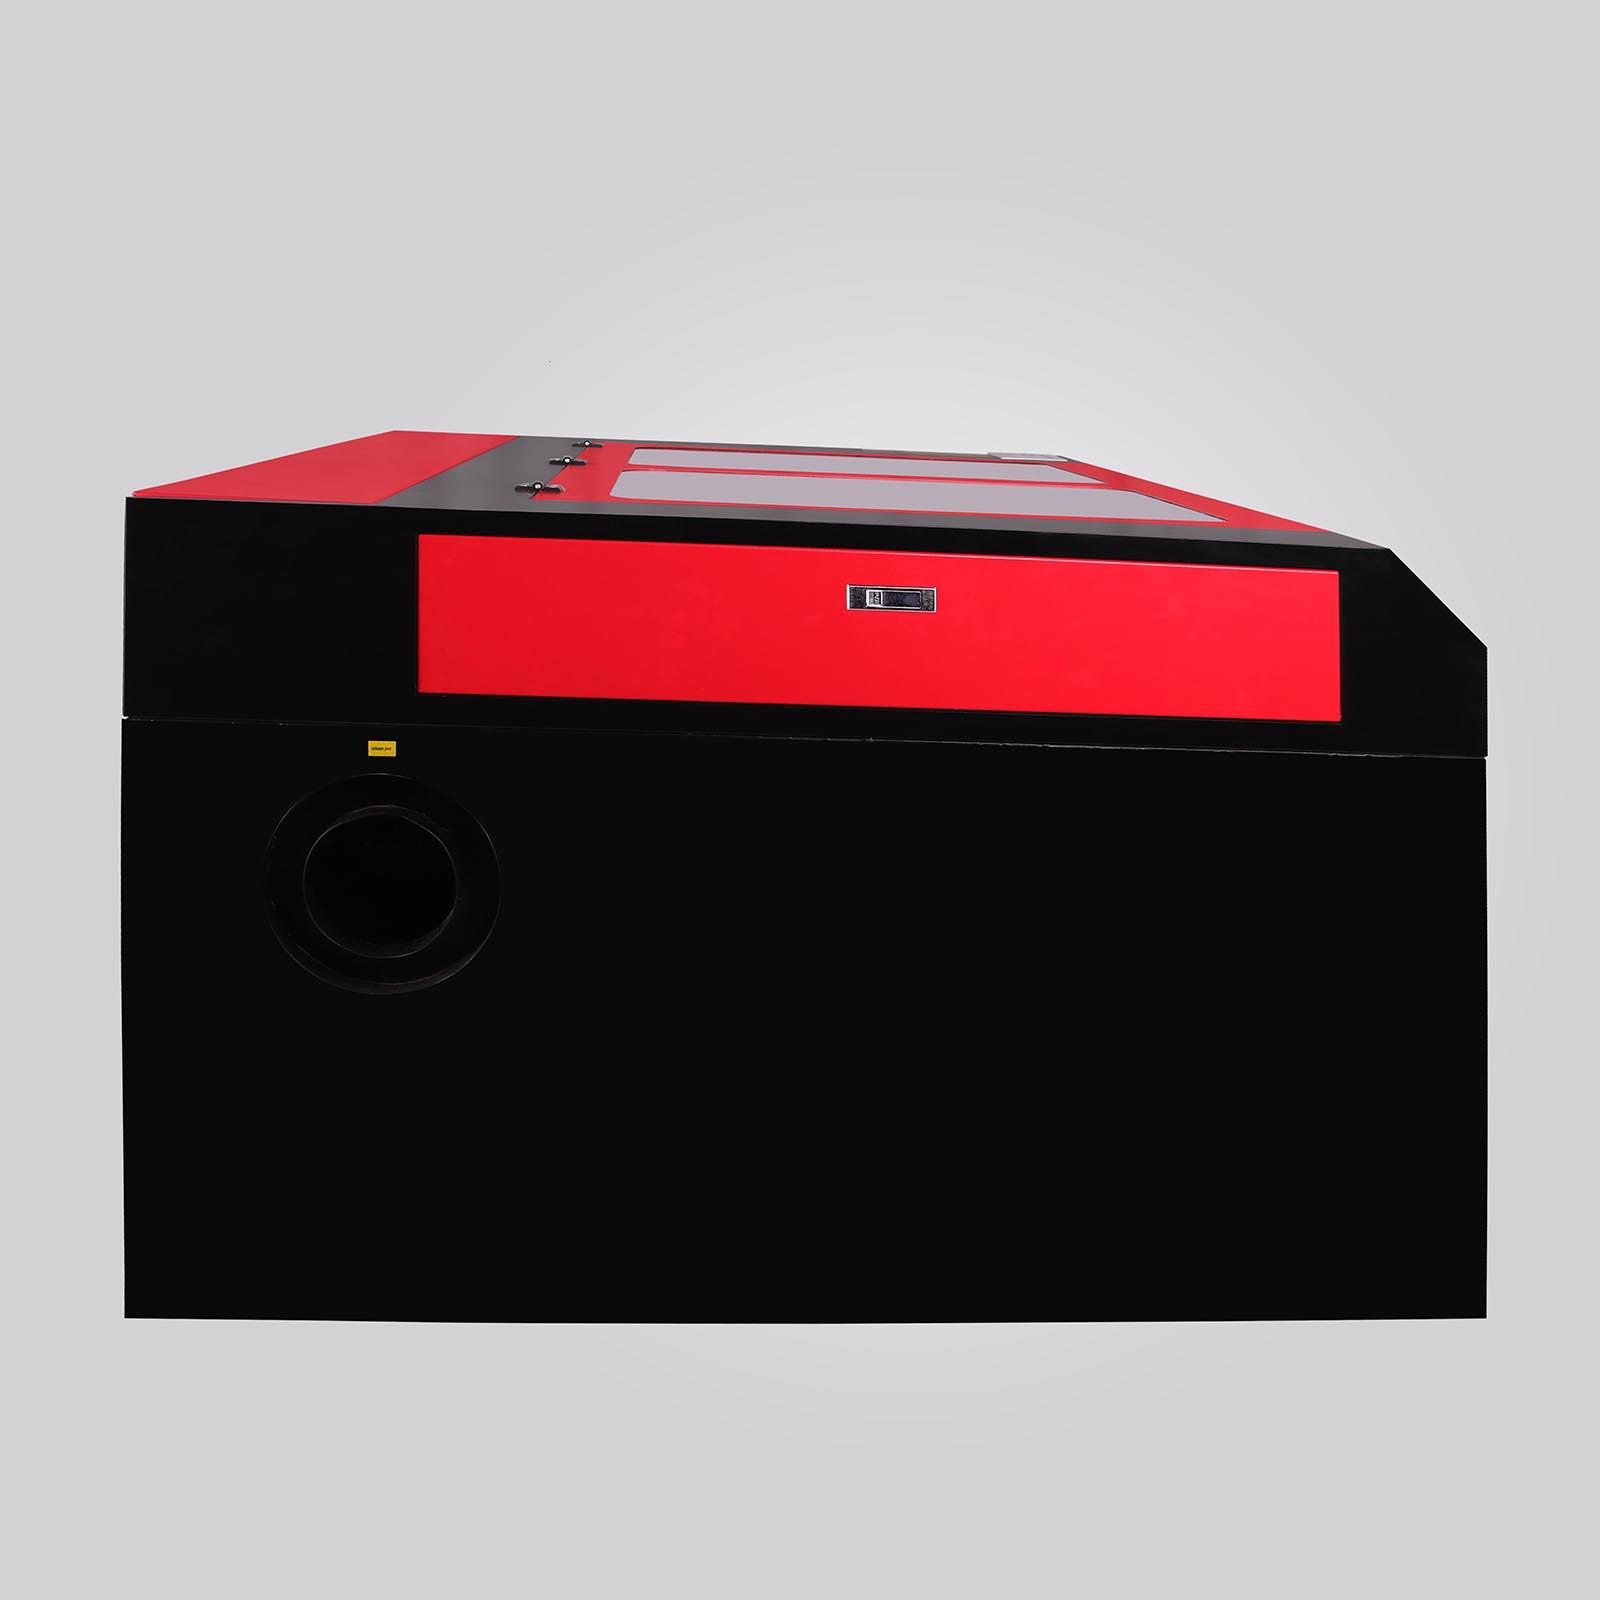 Macchina-per-Incisione-Laser-CO2-40-130W-Asse-Rotante-Tagliatrice-Incisore miniatura 75